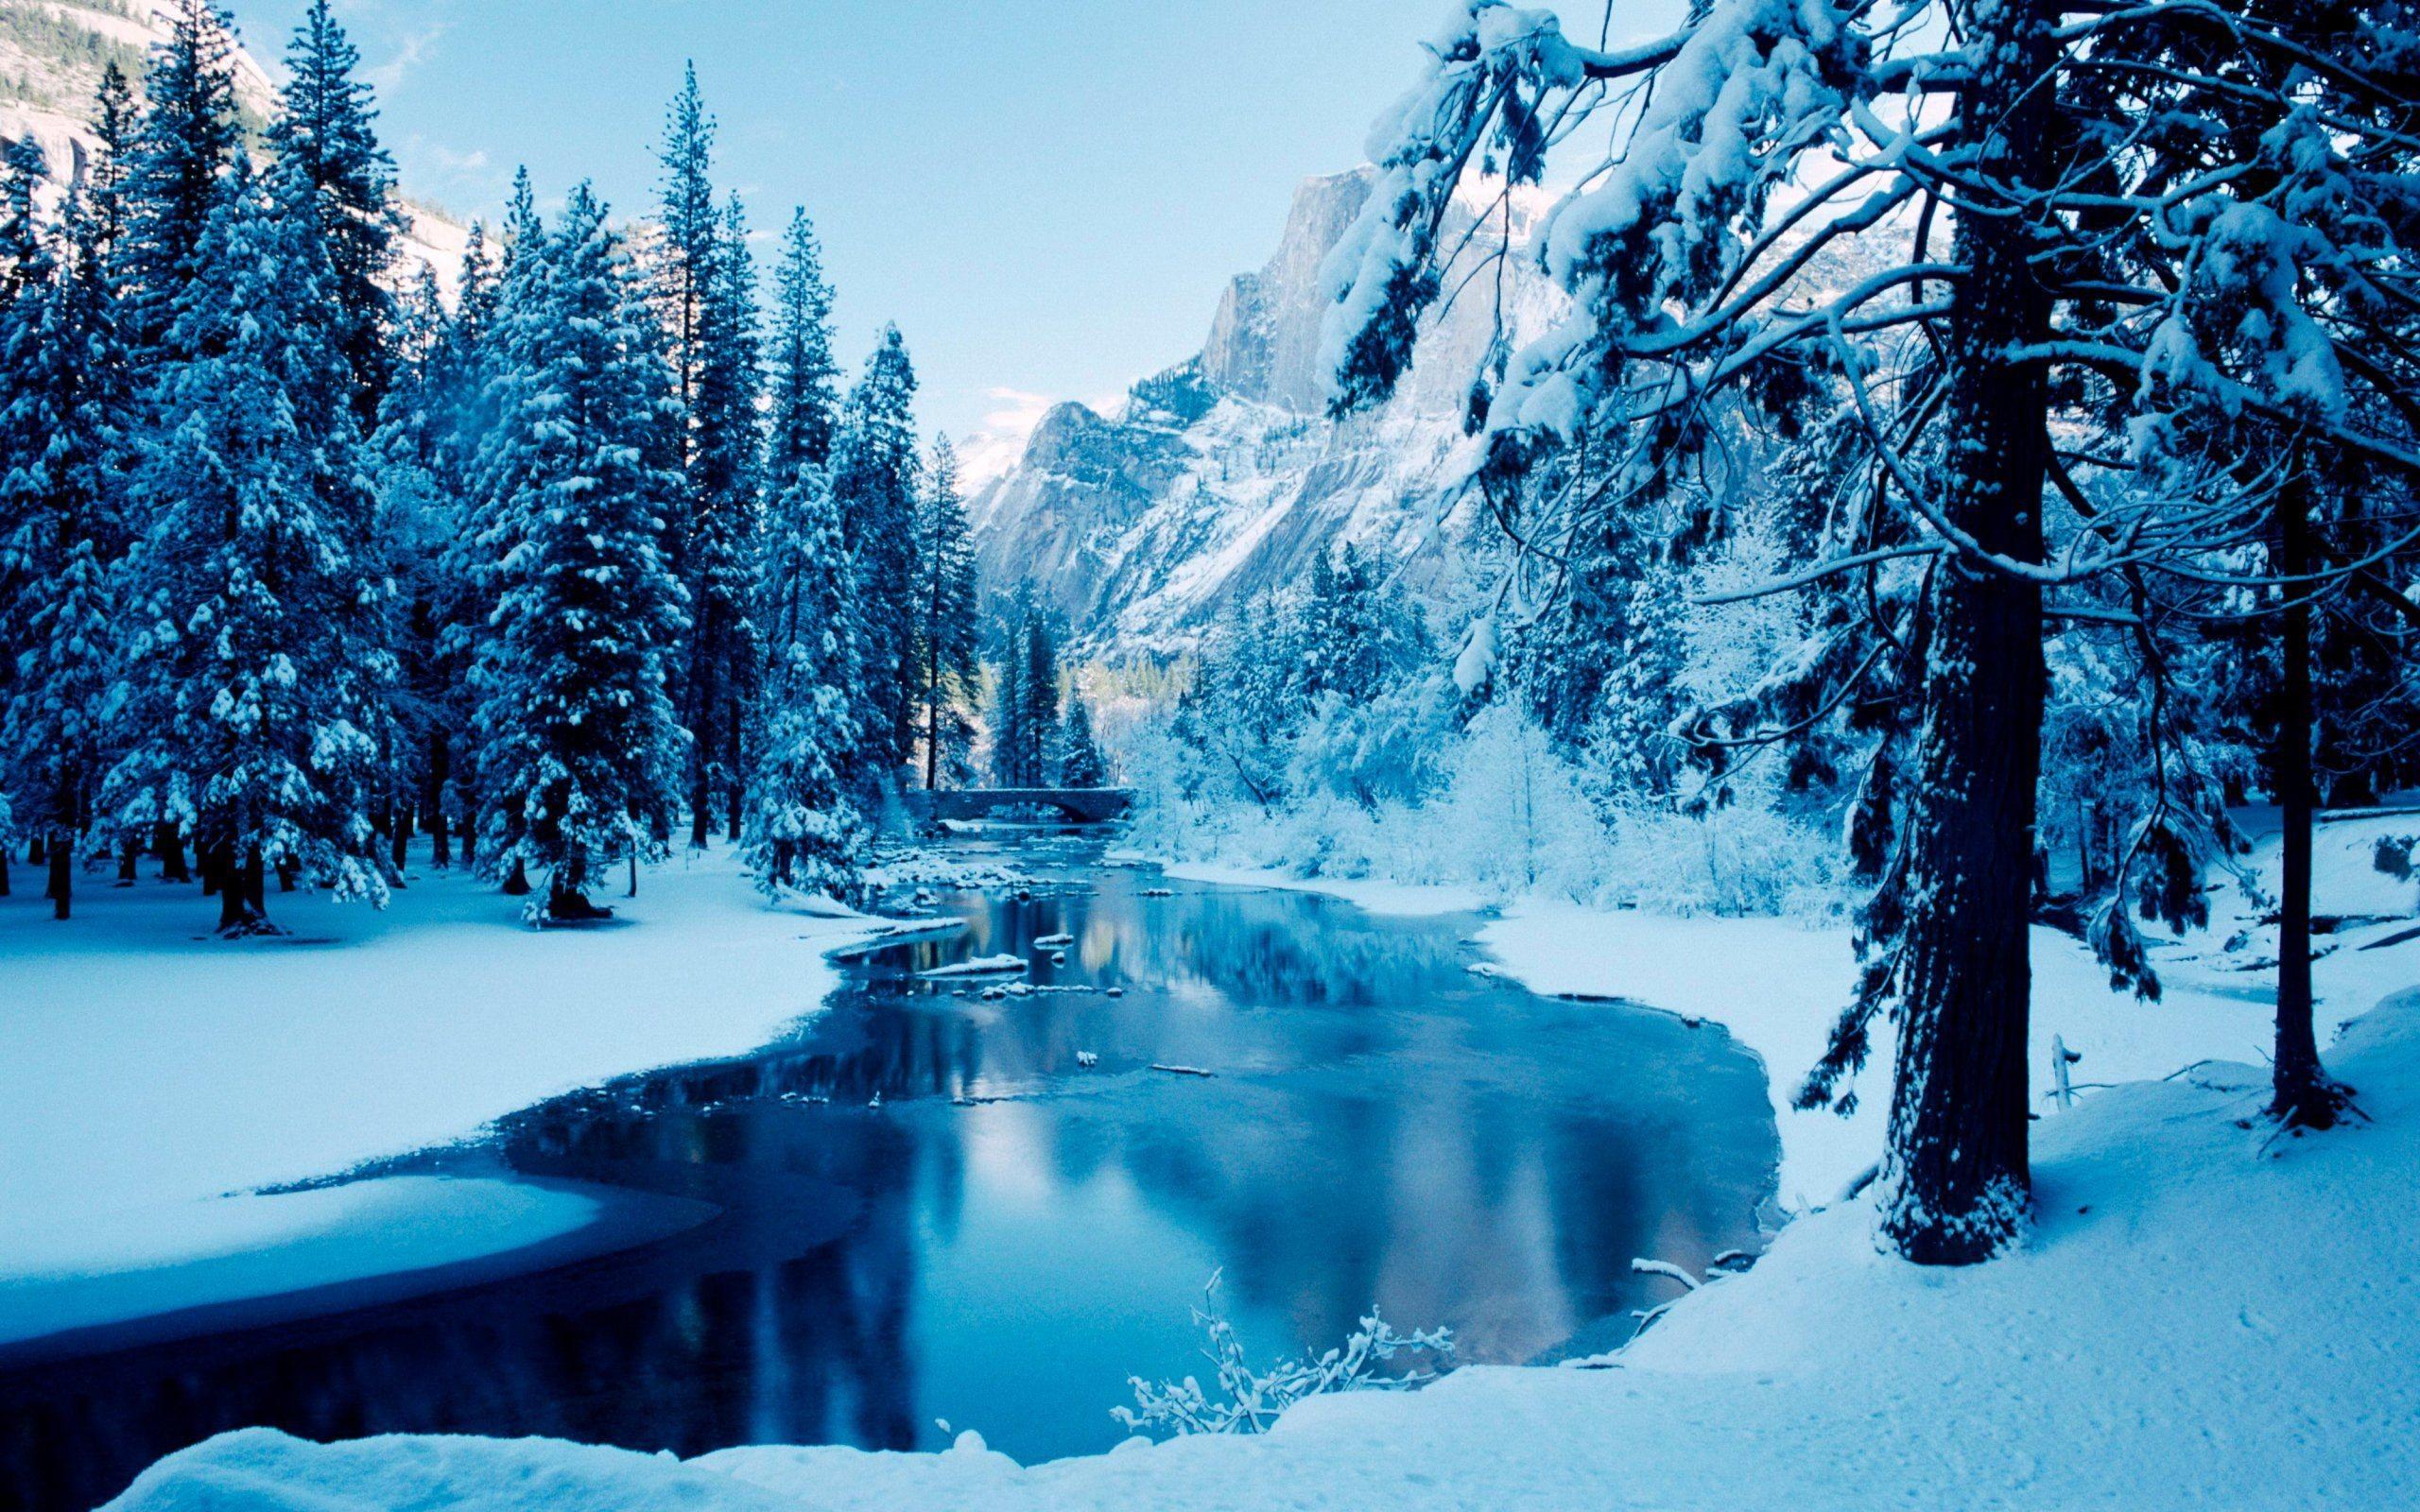 Winter Scenes Desktop Wallpaper – 2560?1600 High Definition .